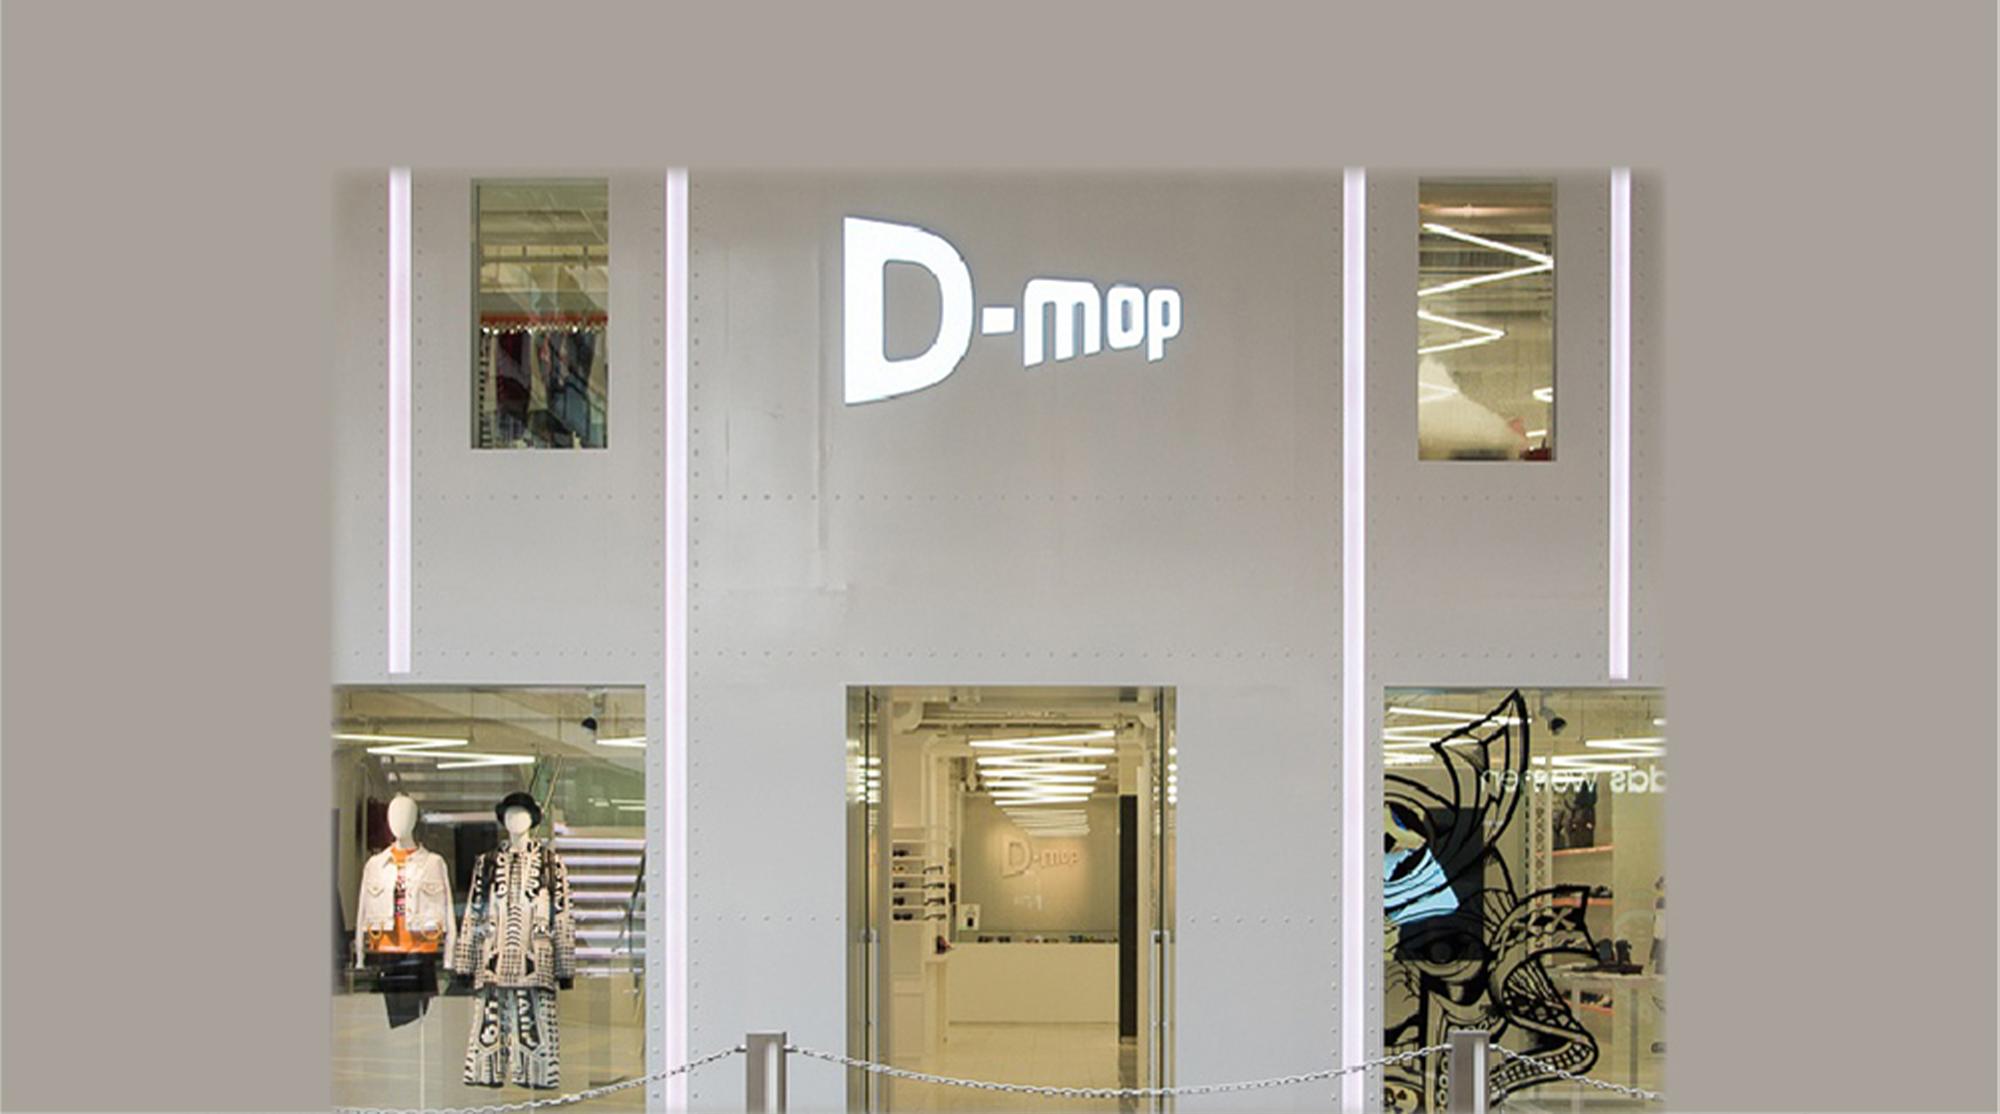 D-mop: 购买正价货品可享九折,减价货品可享九五折 @...